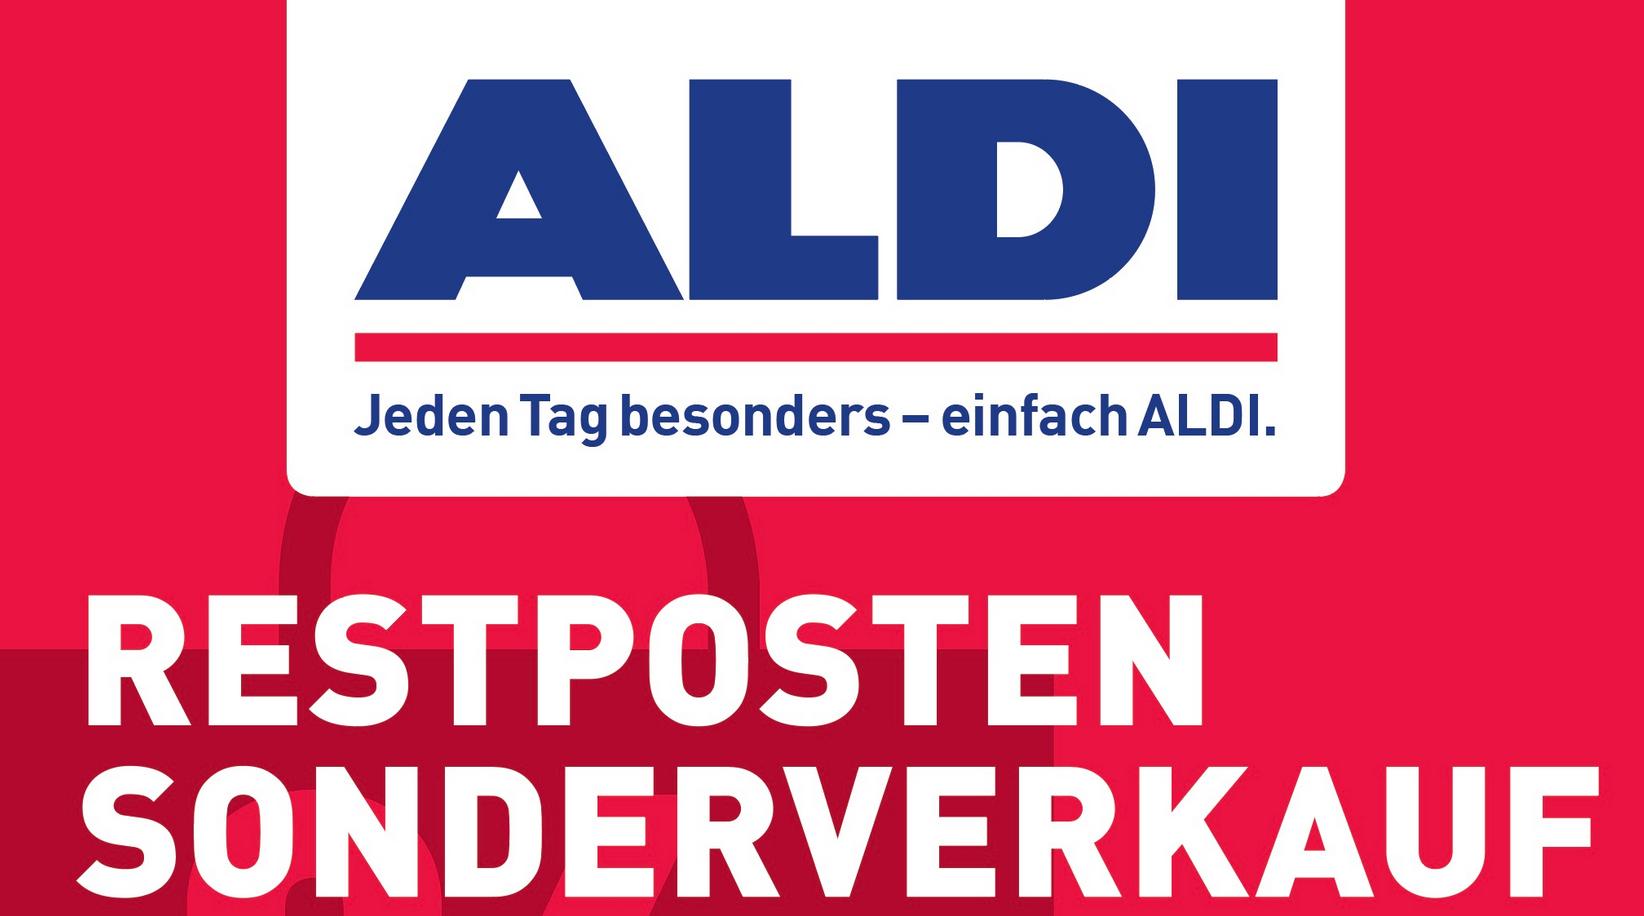 "[Lokal HH] Hamburg * BIS SAMSTAG  * ALDI Sonderverkauf Gubener Str. 1 / Kärcher Fenstersauger 25€, Medion Curved 27 "" 120€"